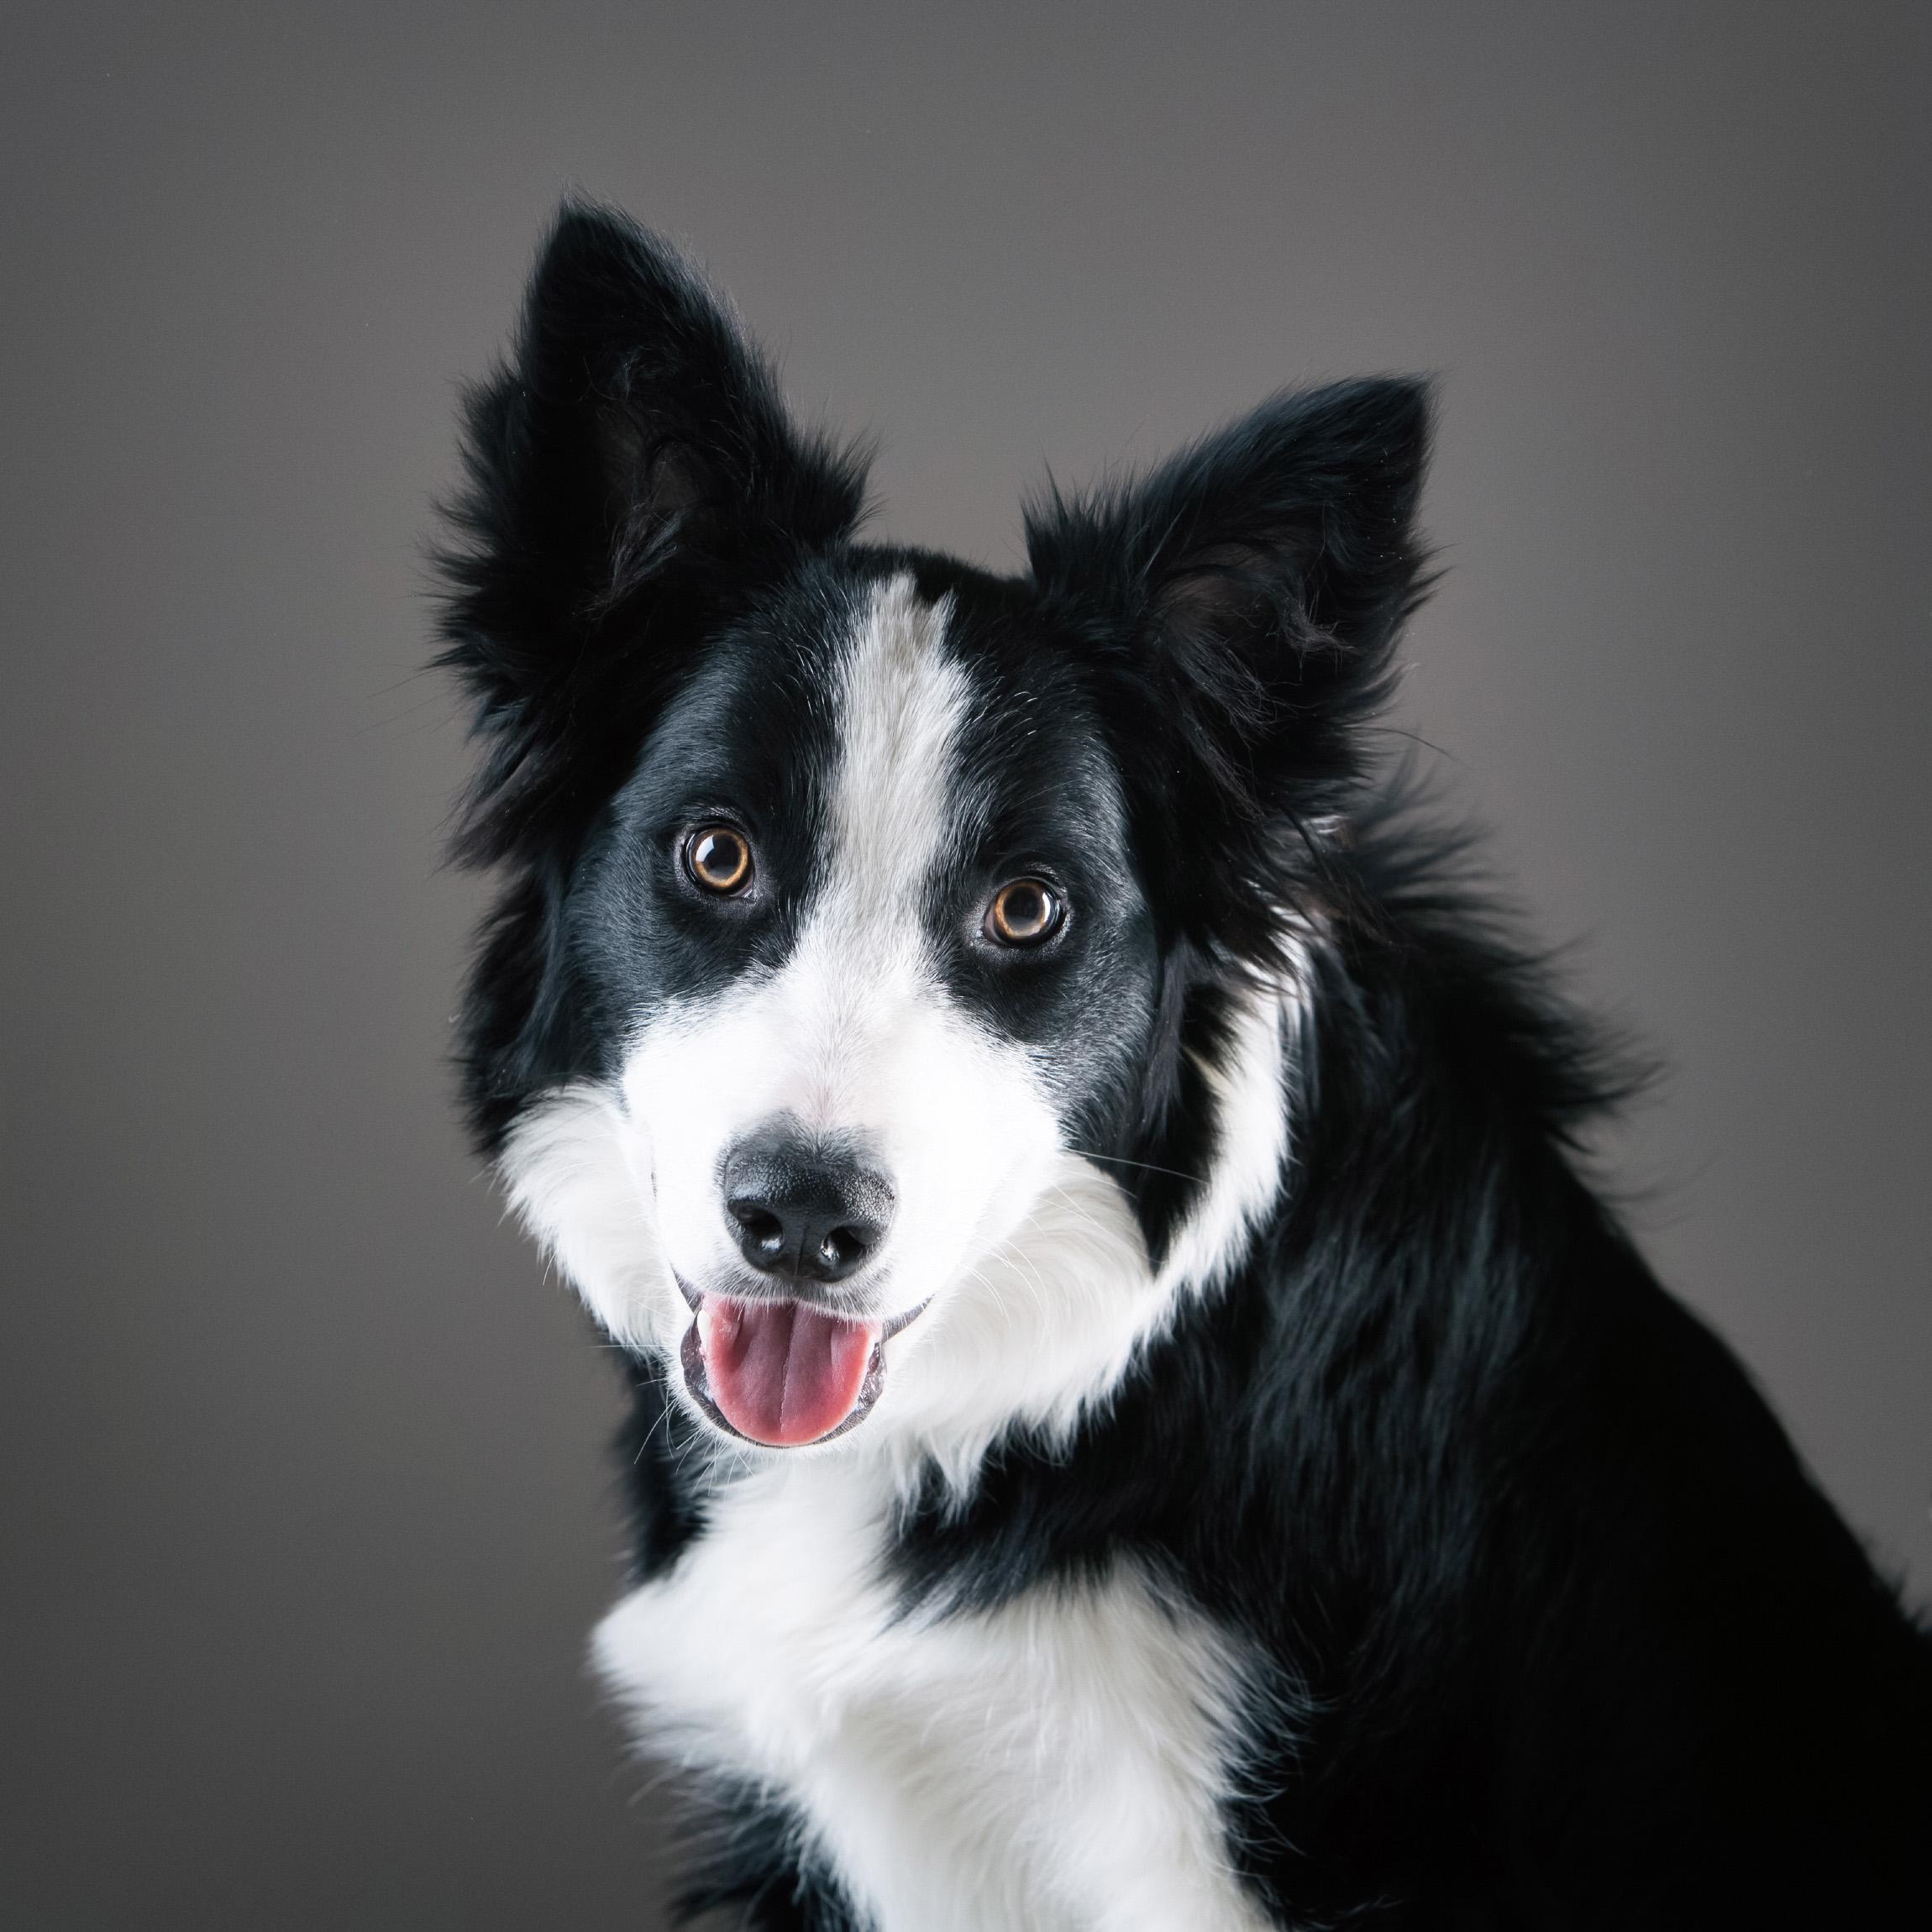 06 foto-gossos-celine-pech-andorra-0159